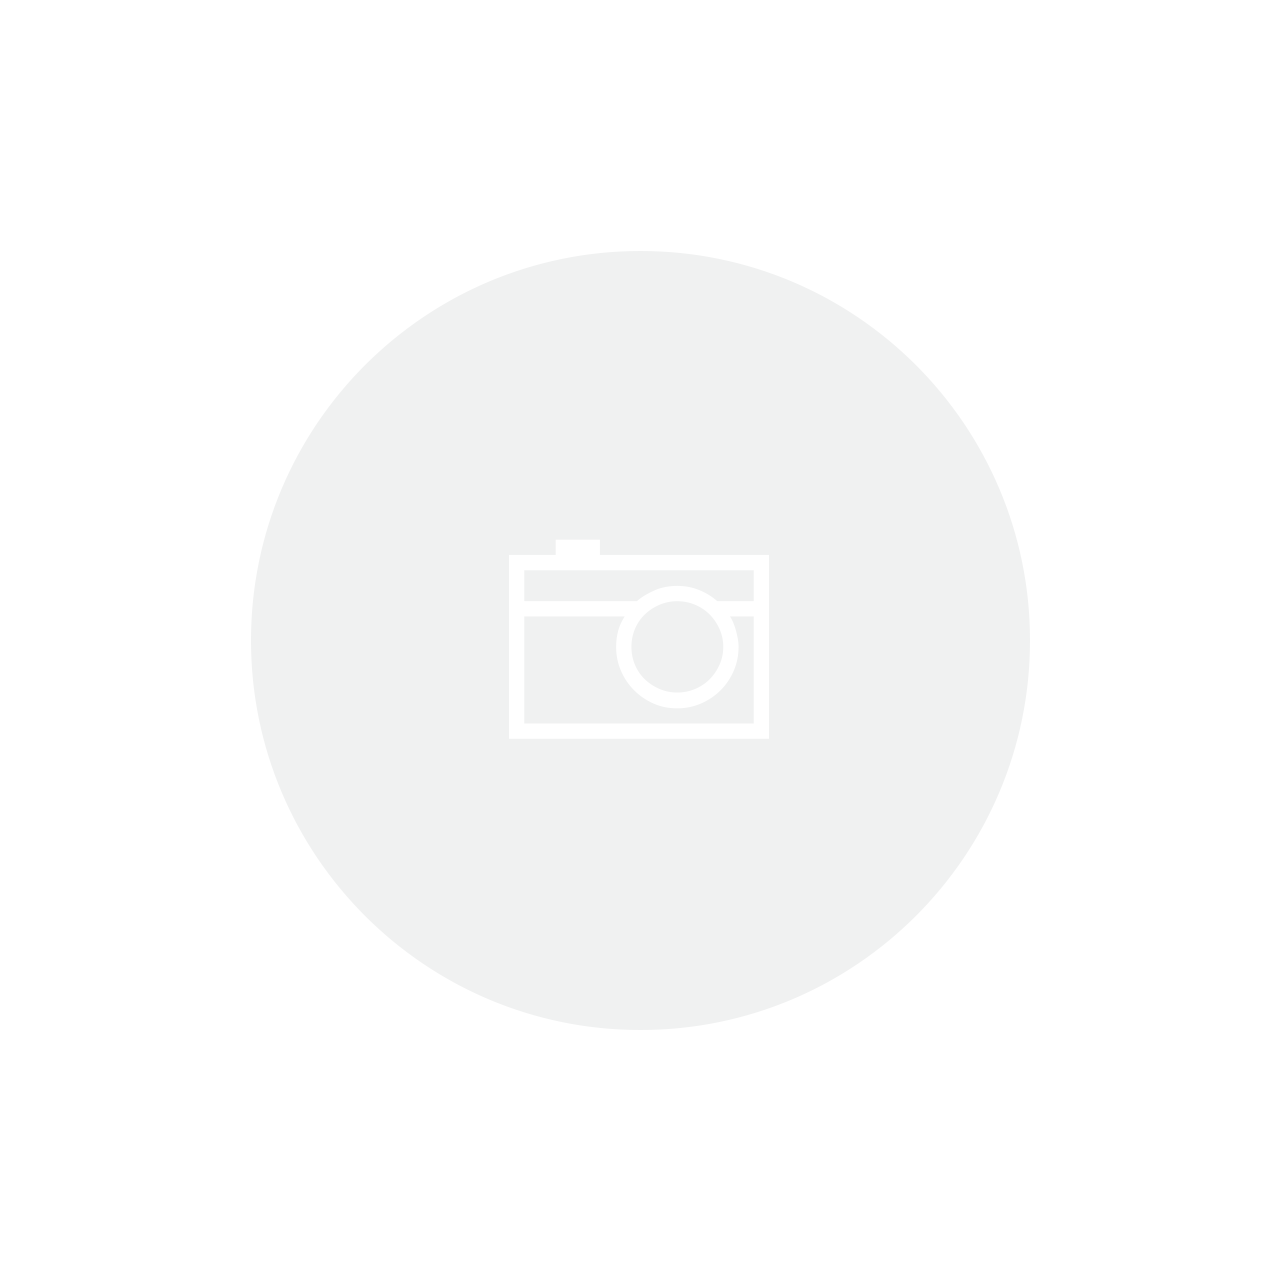 BICICLETA SPEED SOUL 3R3 AERO CARBON 22V SHIMANO 105